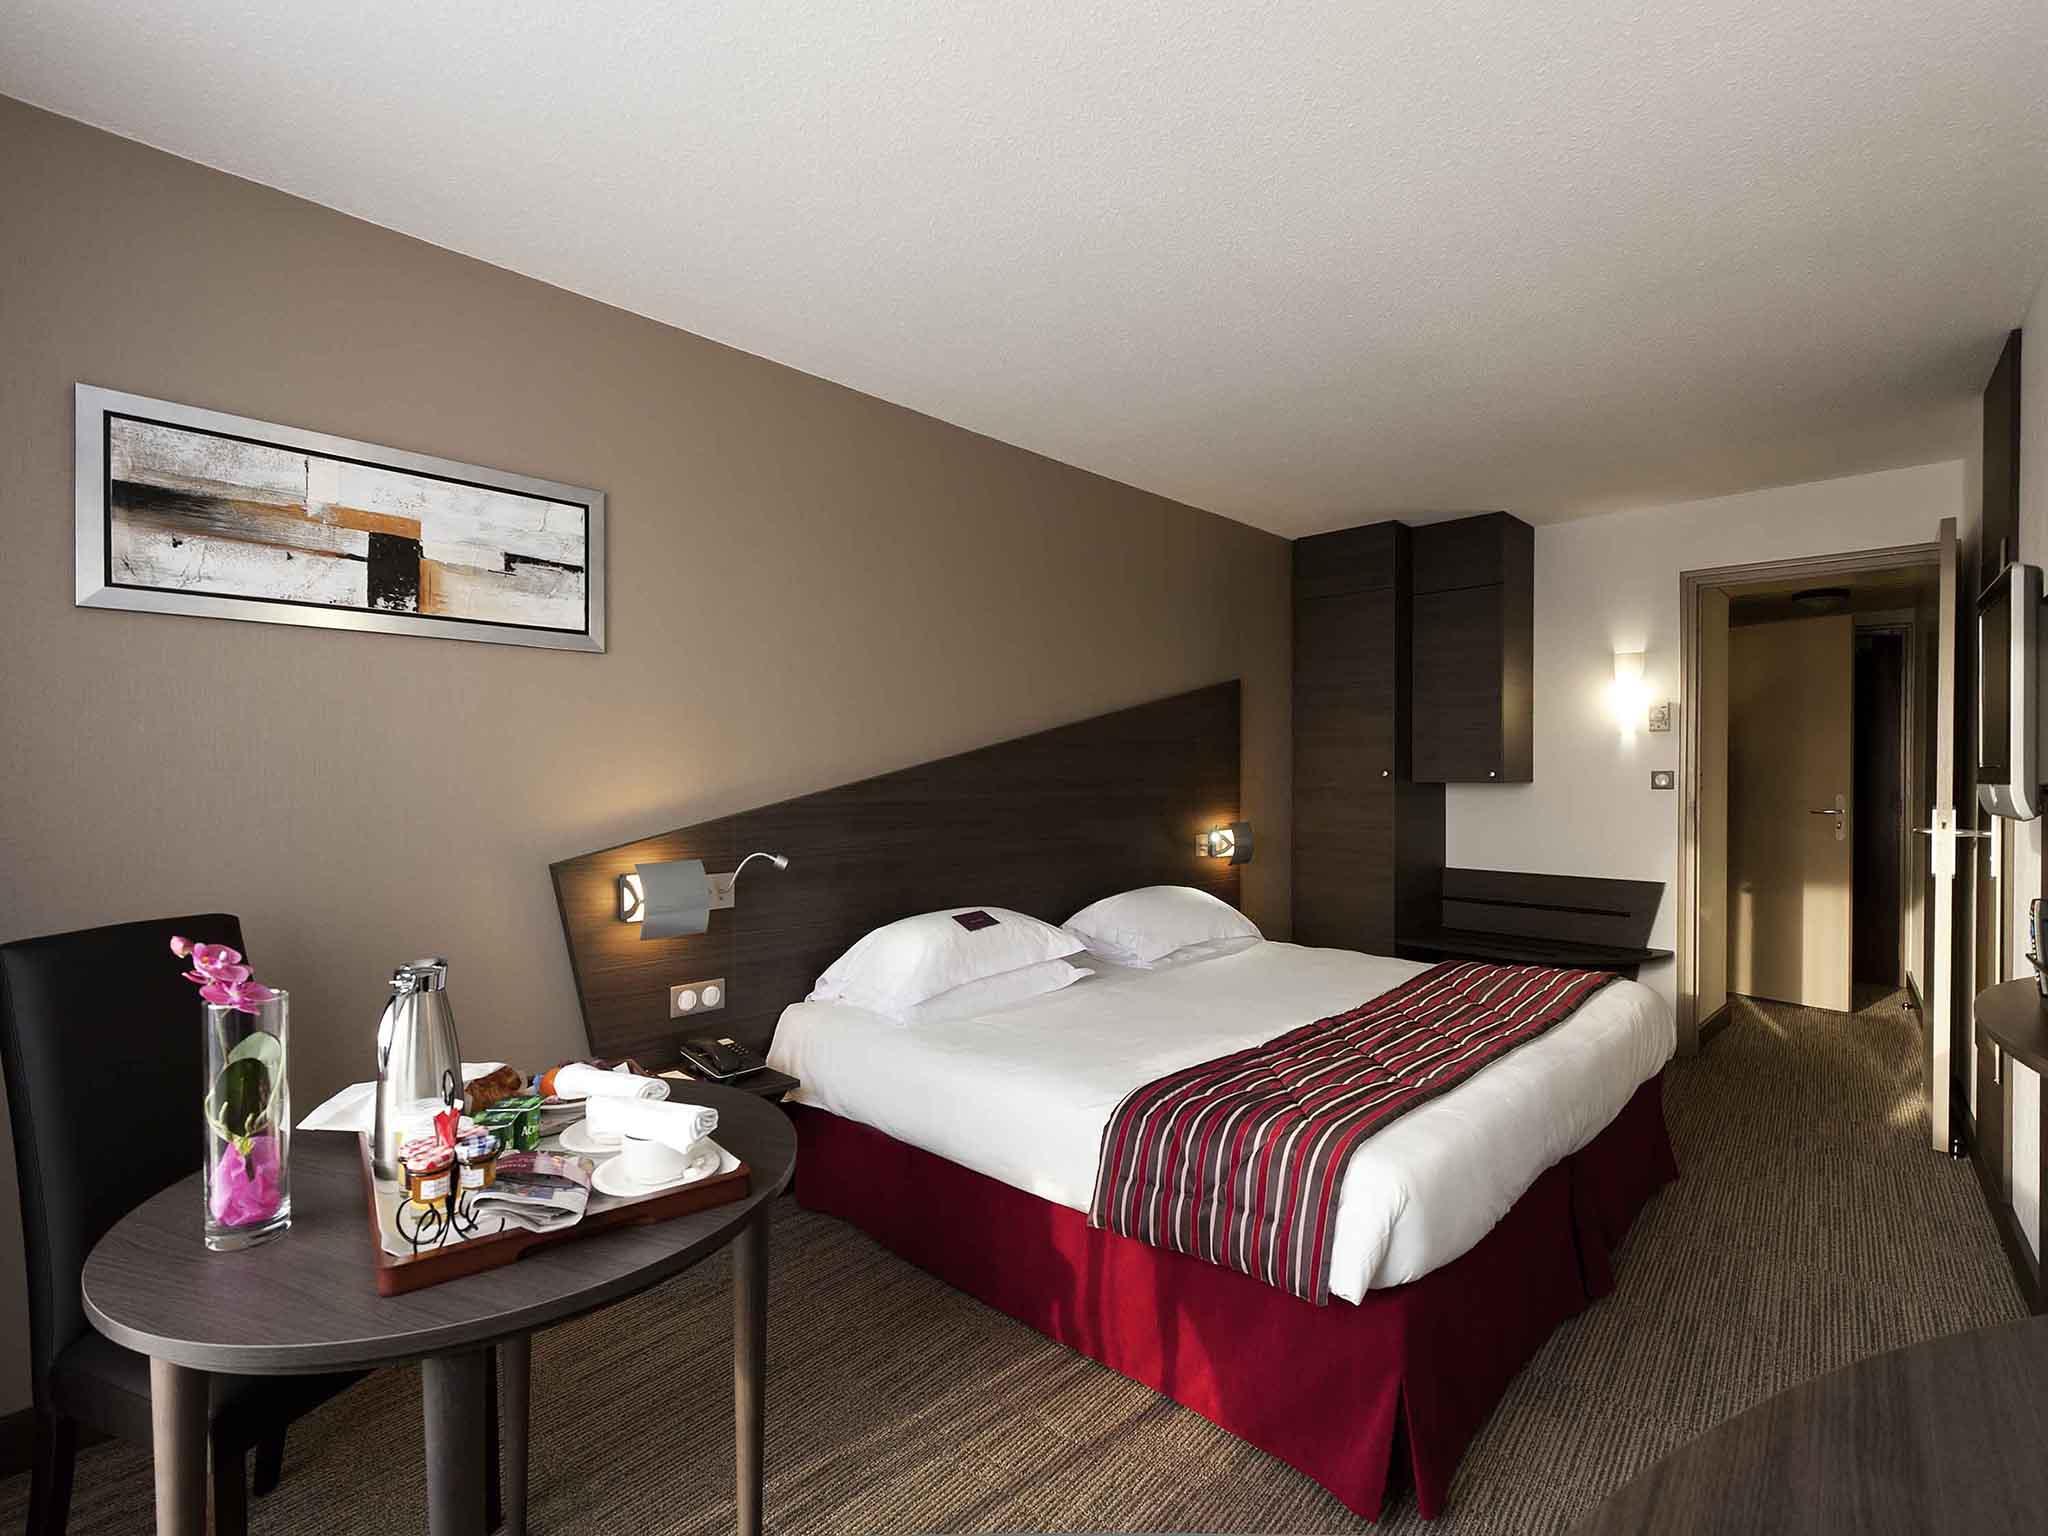 فندق - Hôtel Mercure Vannes Le Port